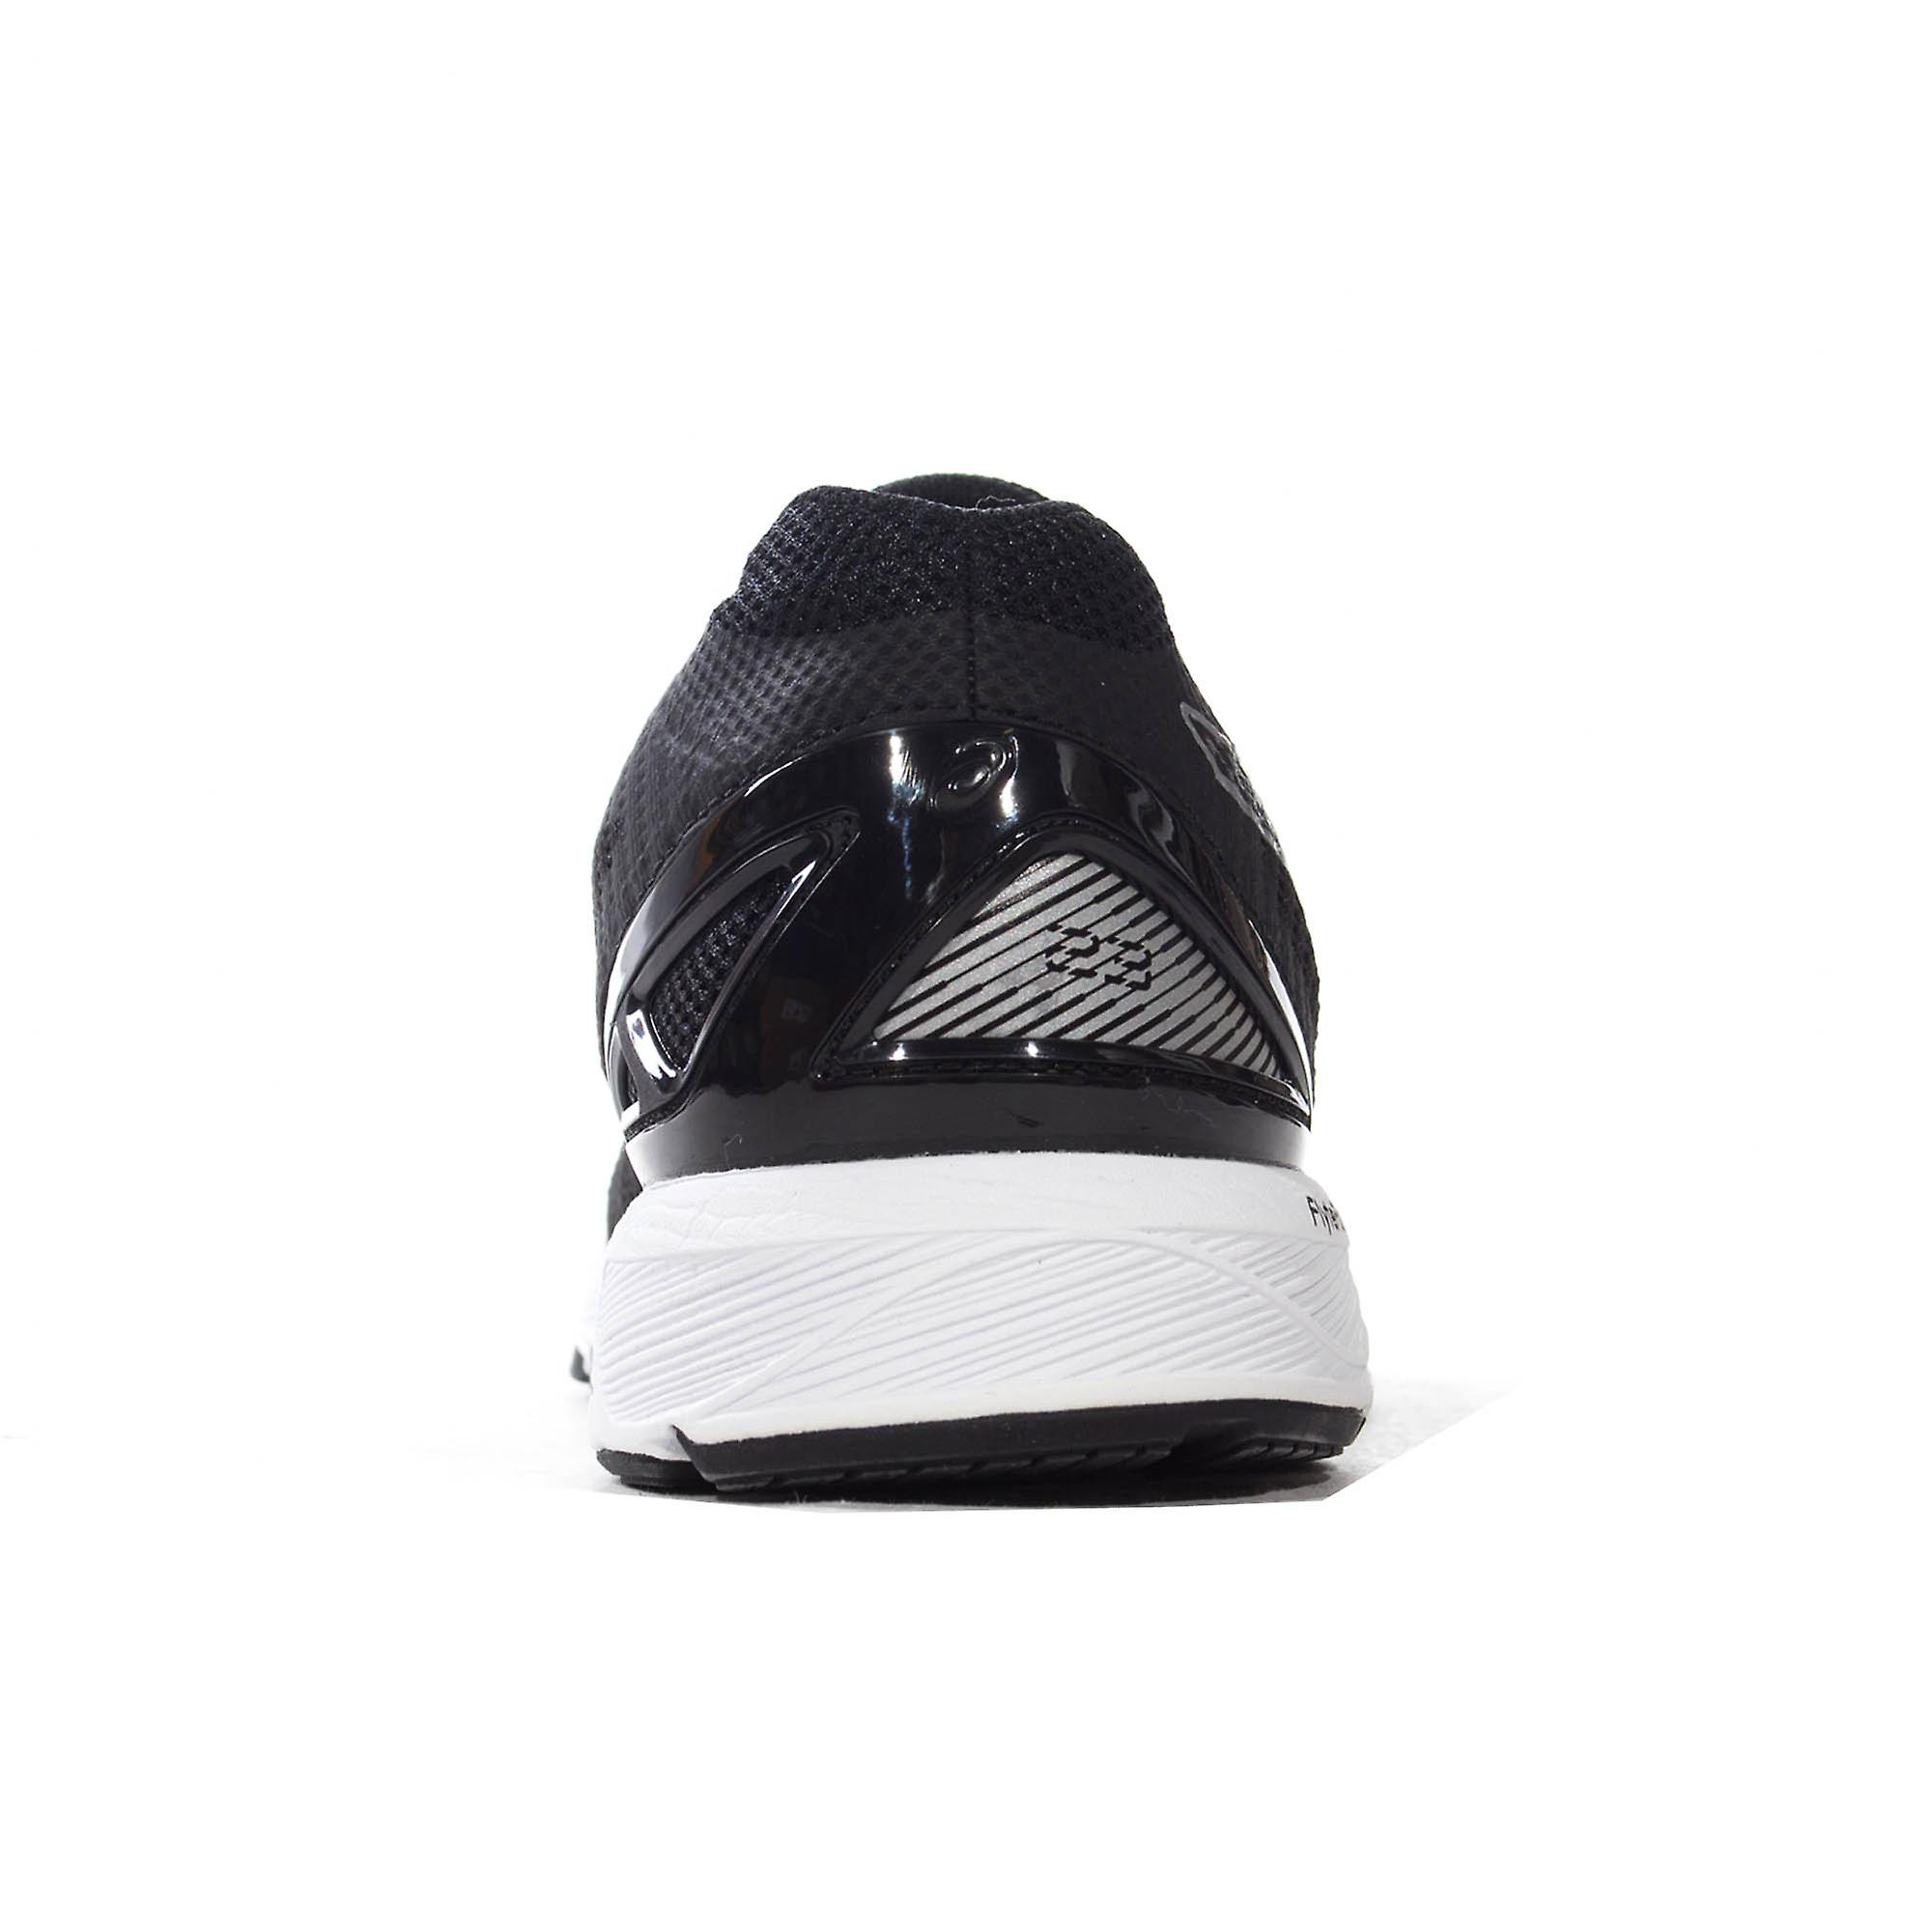 Asics Gel-DS 23 Womens Ladies Running Trainer Shoe Black/Silver